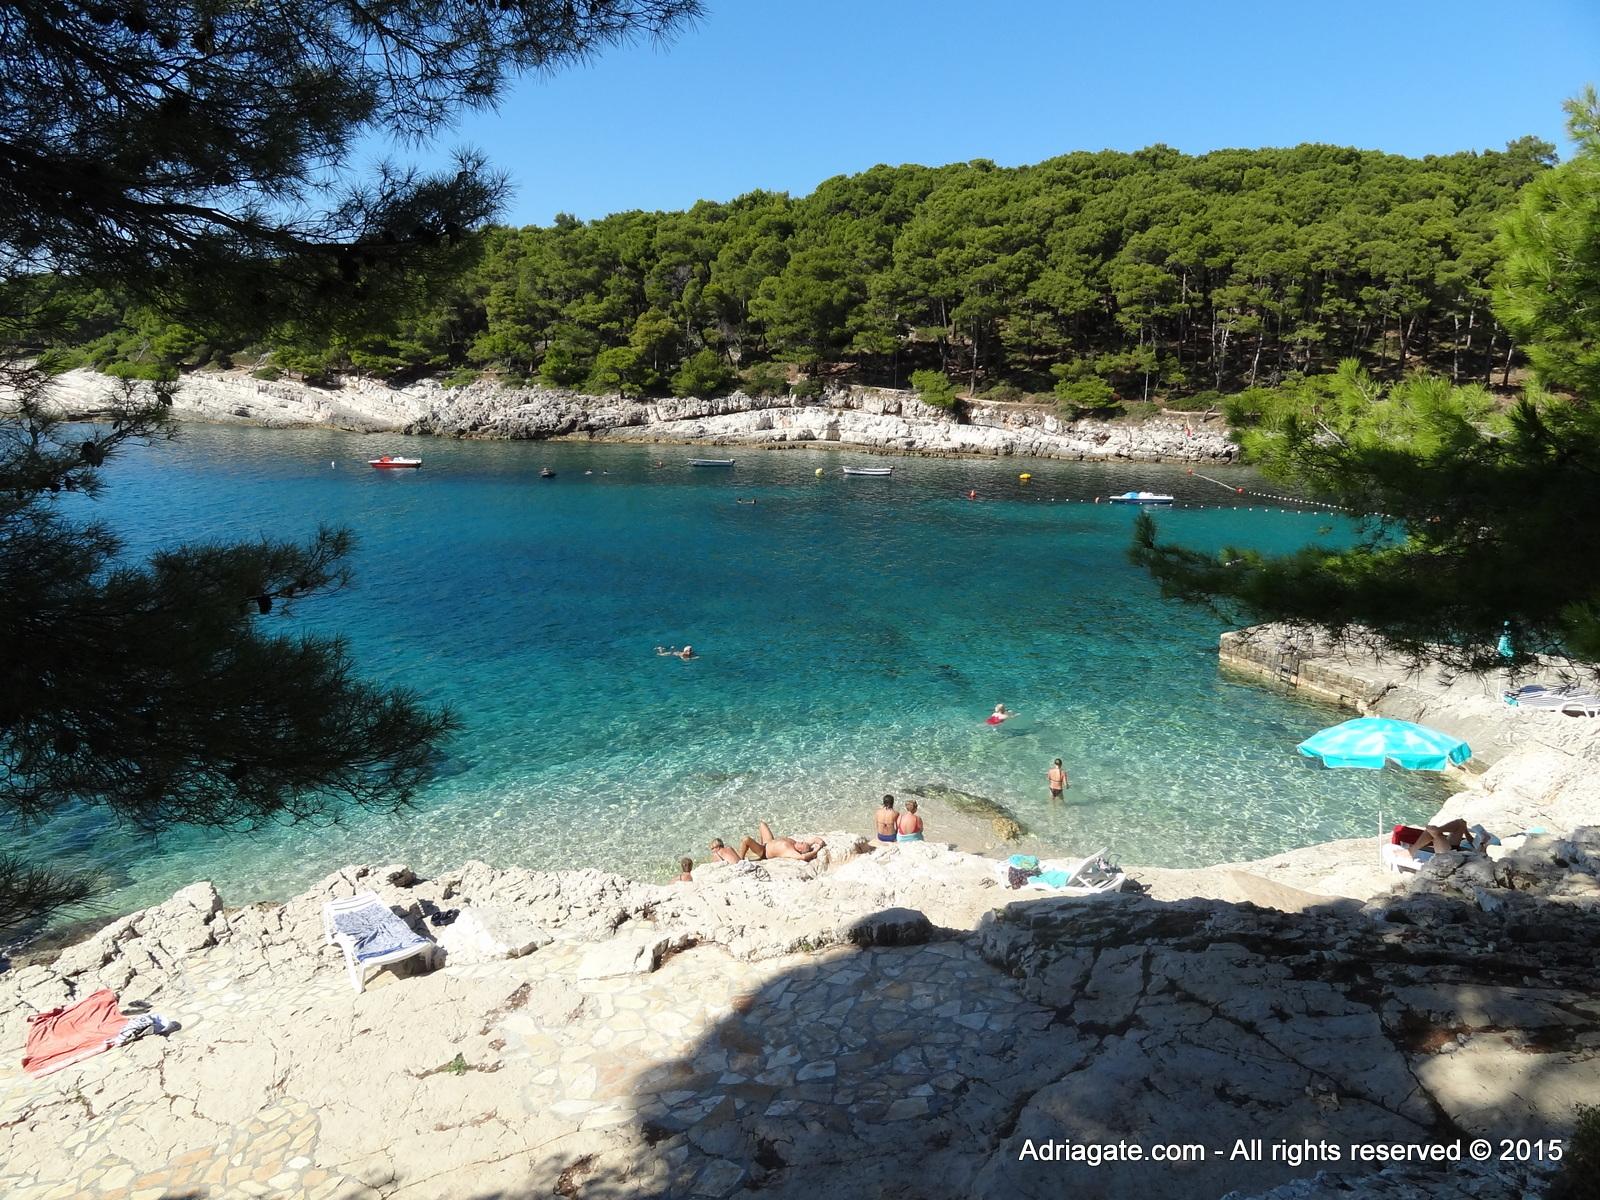 1000+ images about Mali Losinj Croatia on Pinterest.